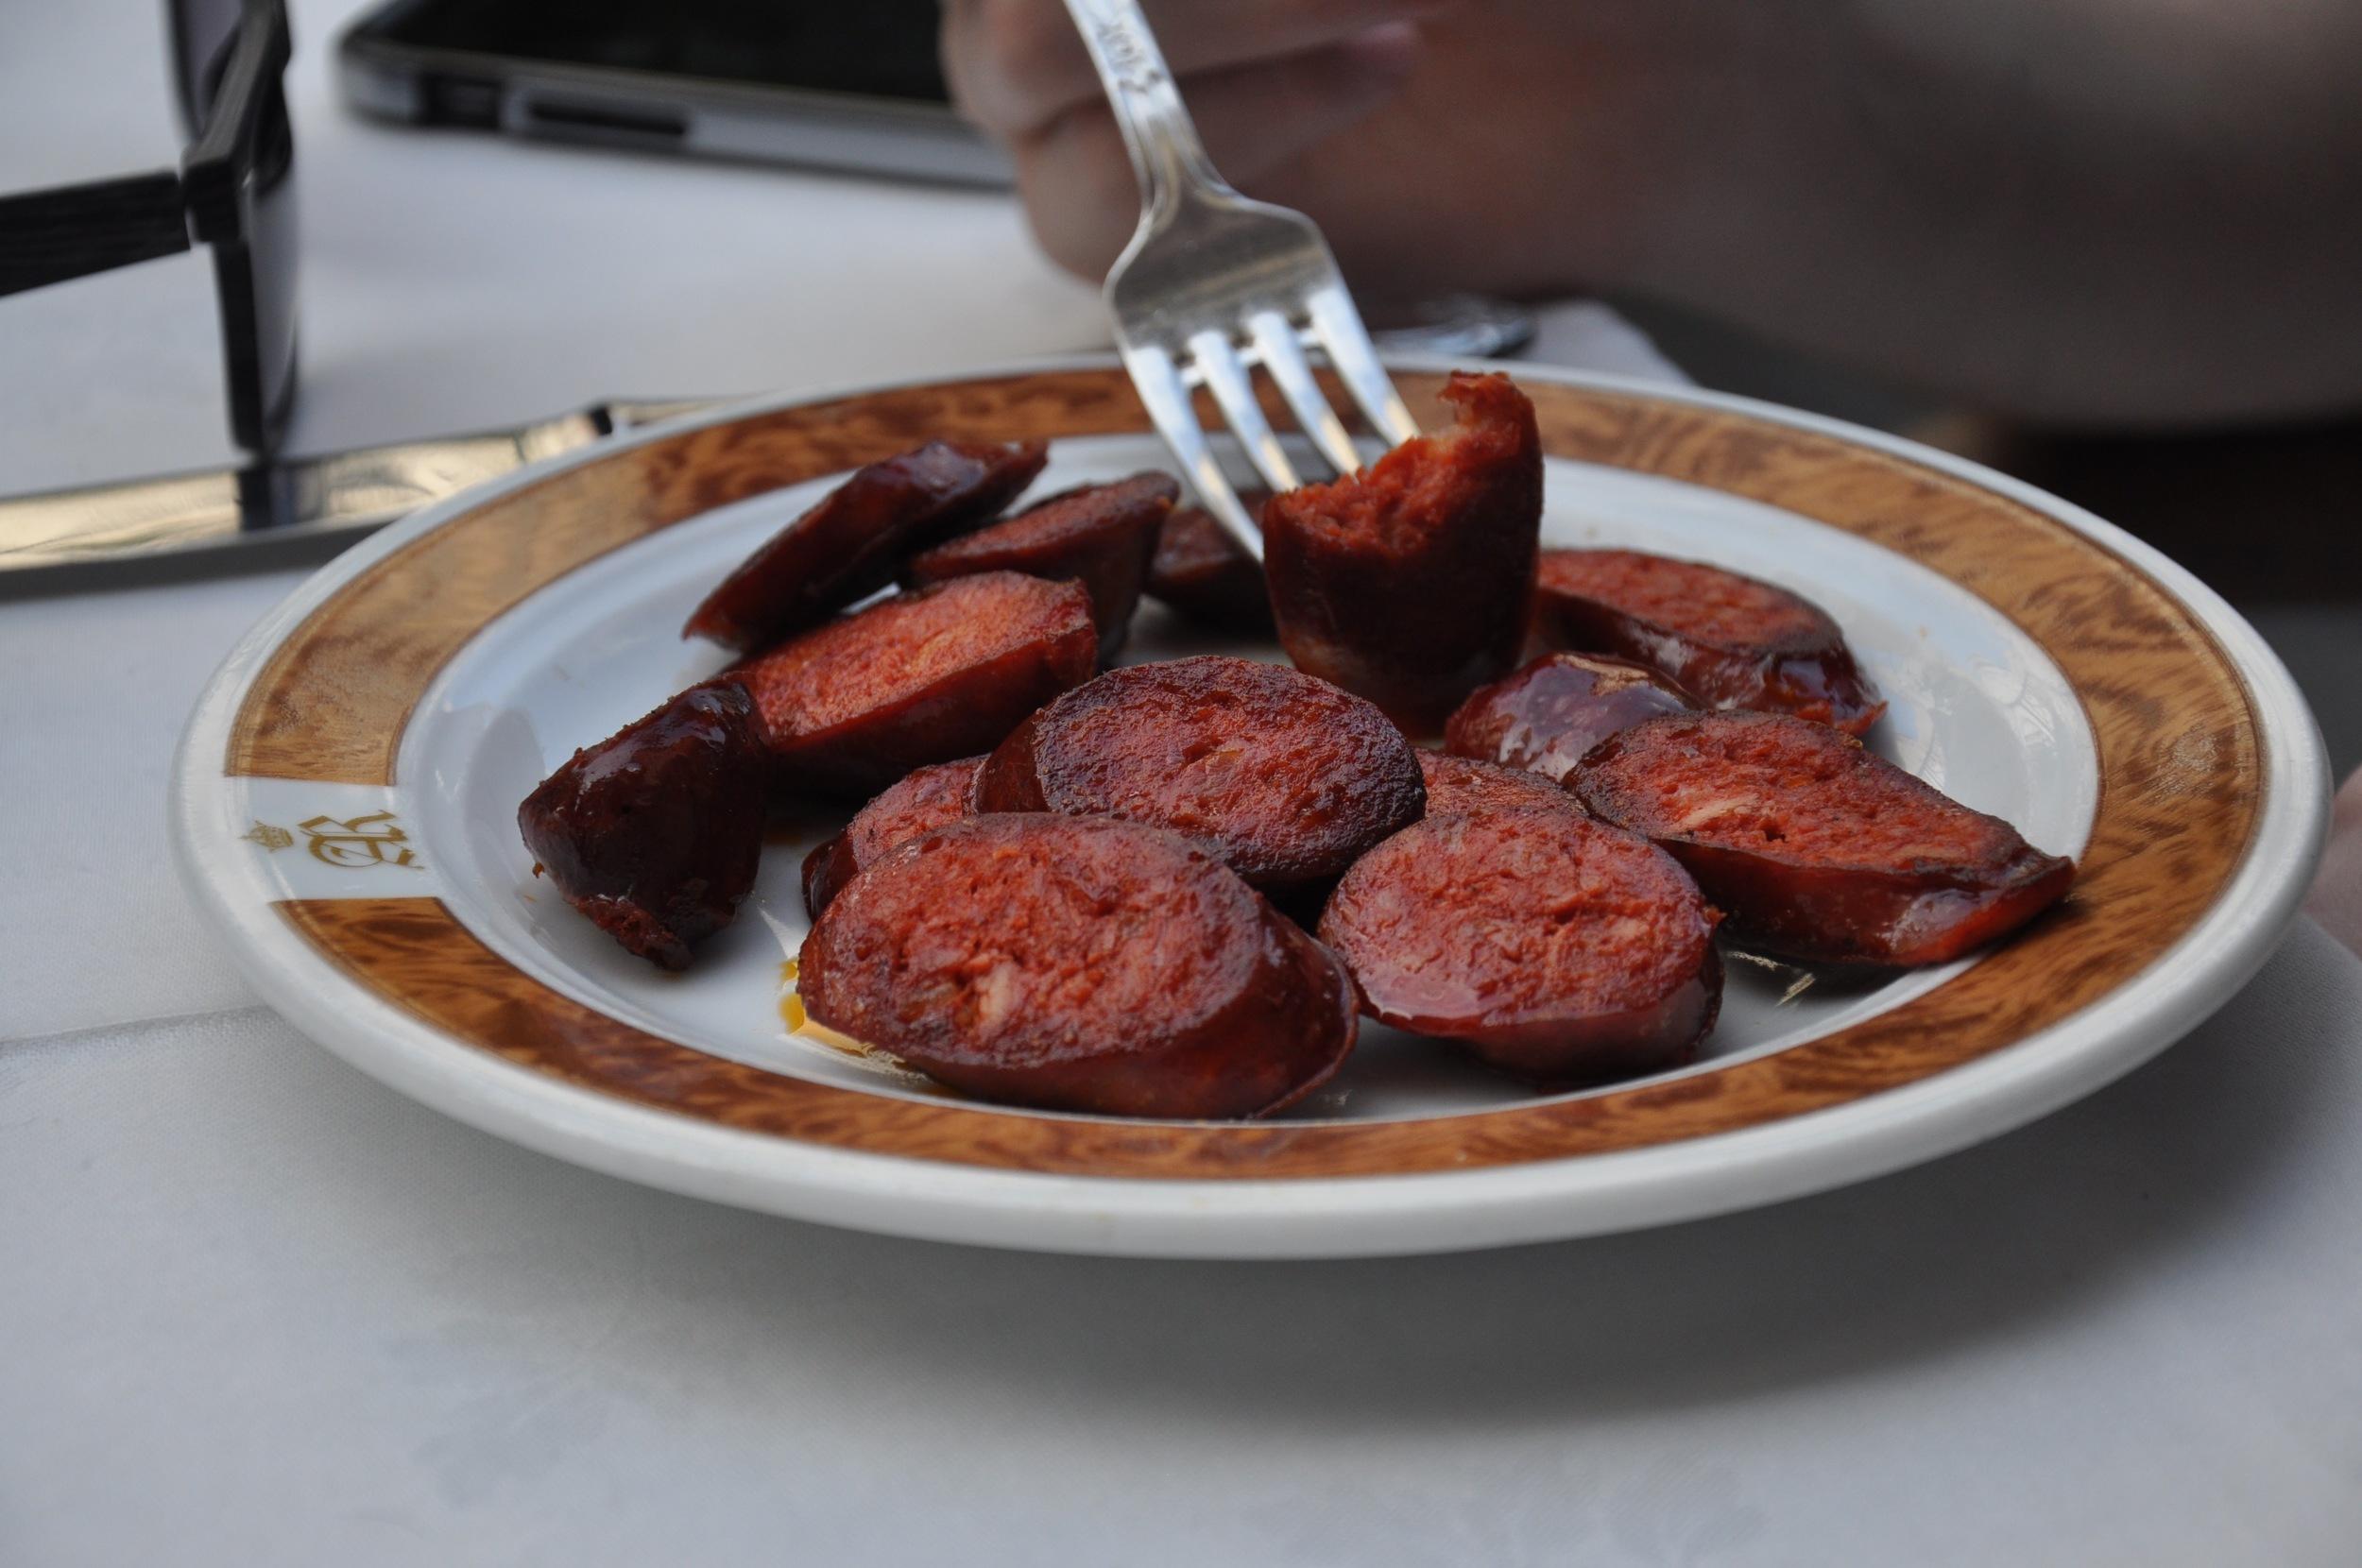 Un chorizo barbacoa casera (homemade barbecue chorizo). It's basically BBQ sausage!